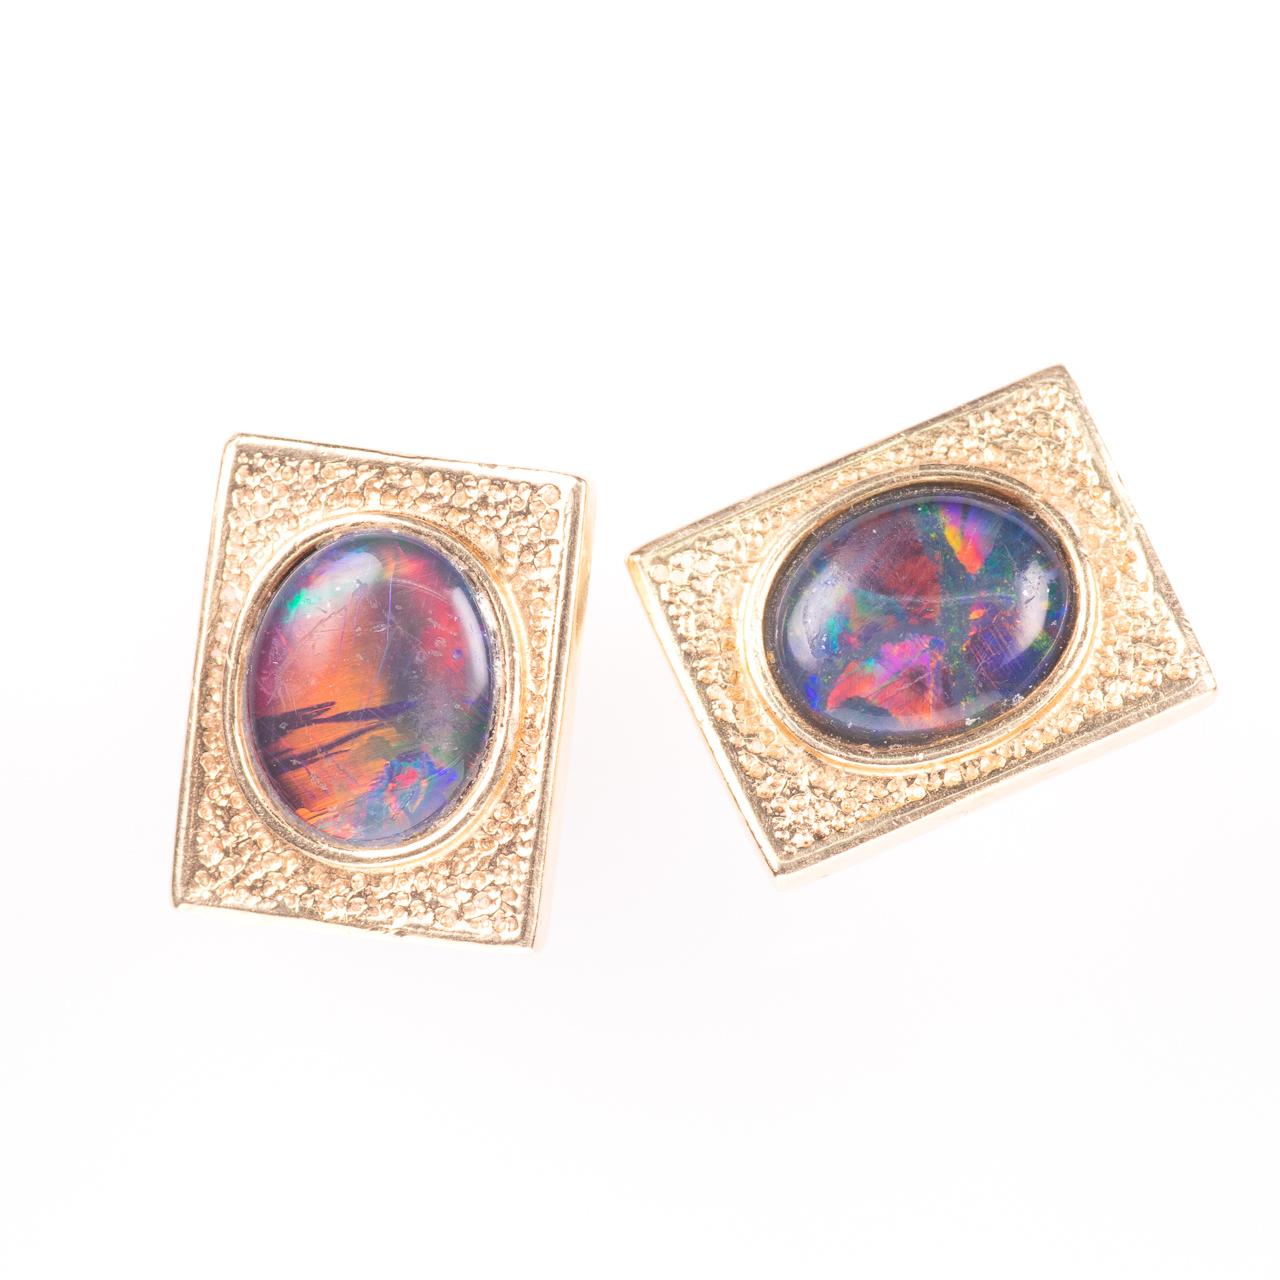 14ct Gold Gentleman's Black Lightning Opal Cufflinks - Image 2 of 6